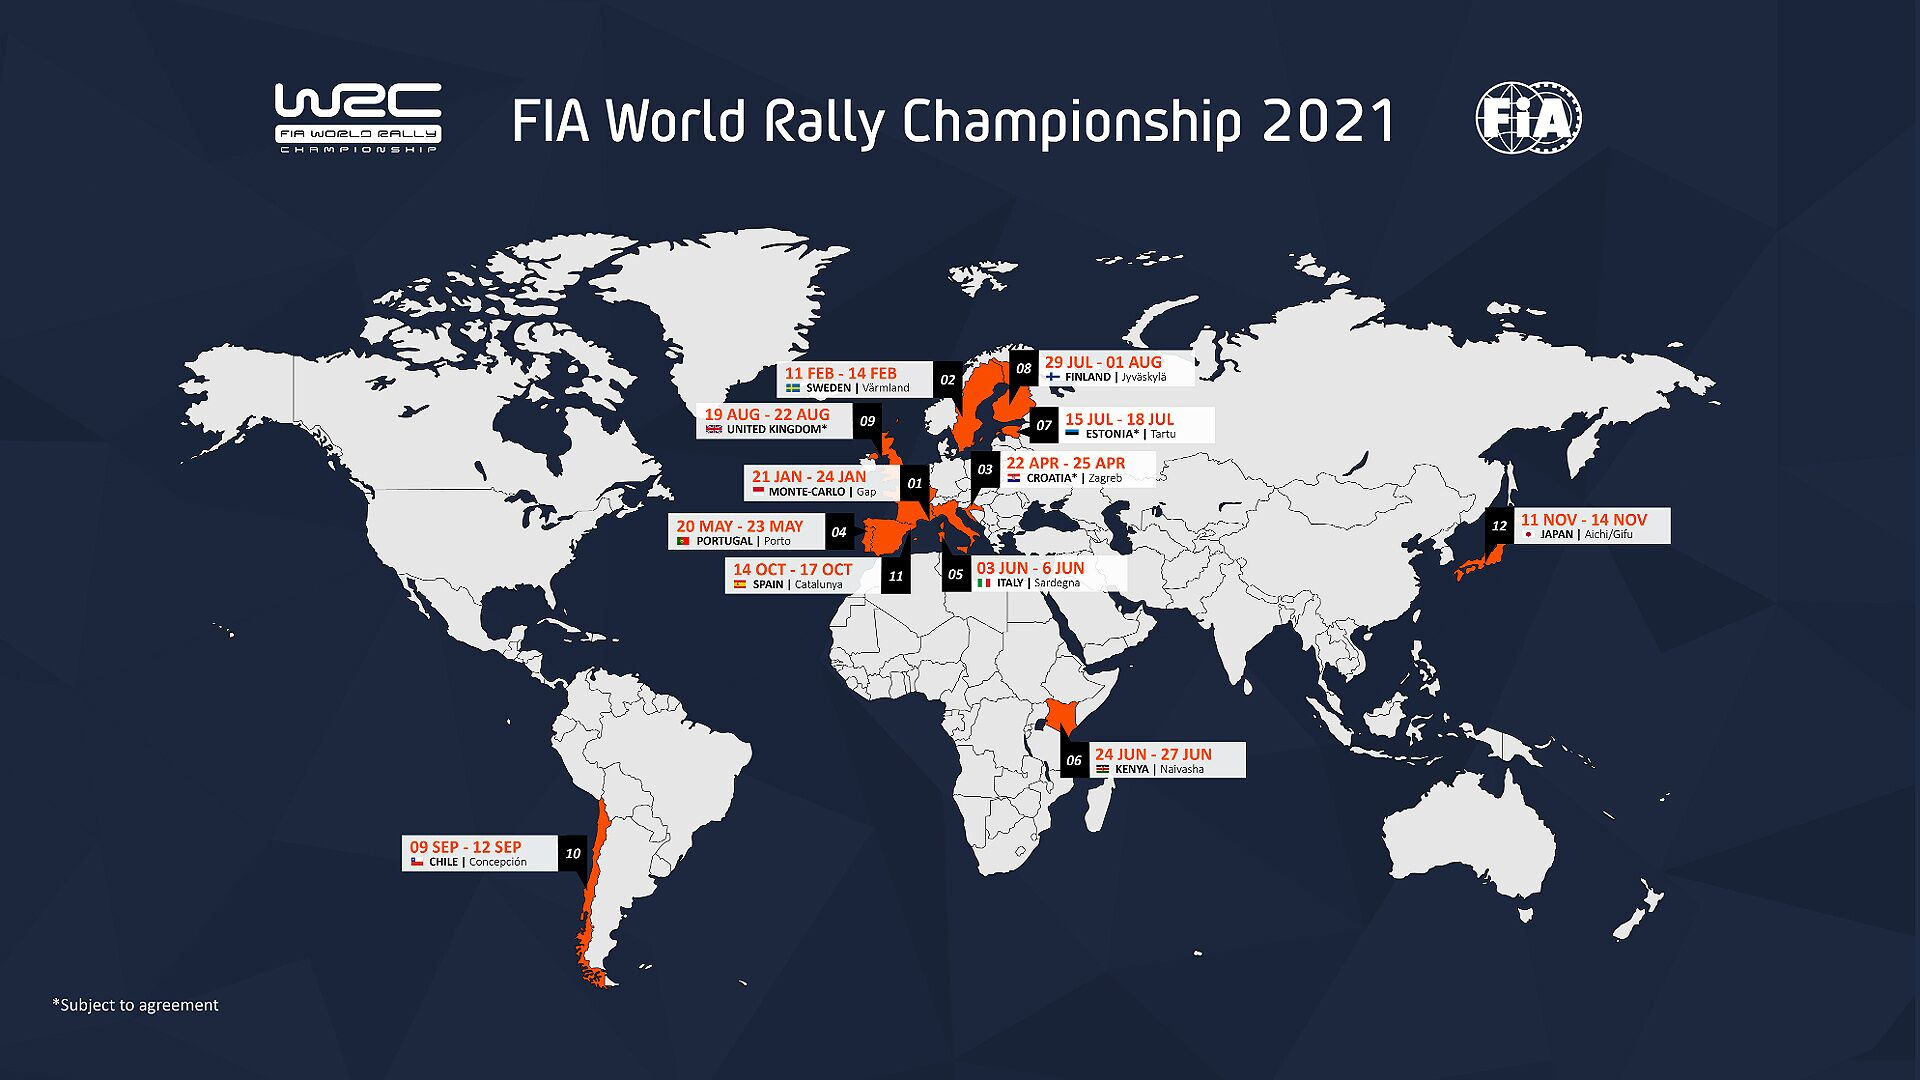 Calendrier 2021 Wrc Croatia and Estonia named in 2021 WRC calendar